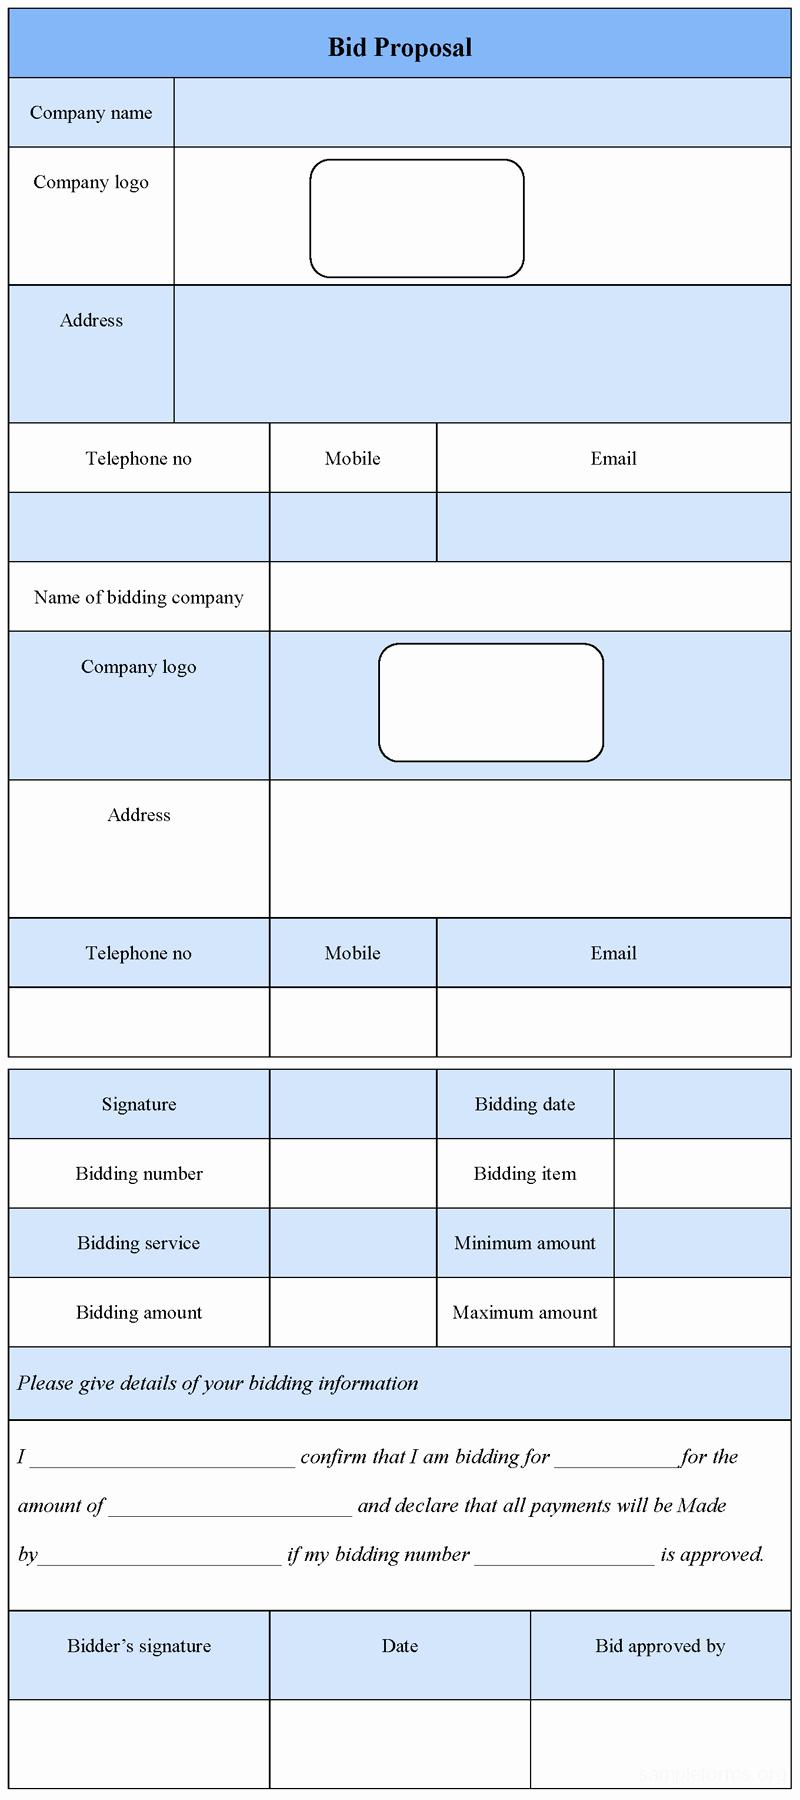 Bid Proposal form Example Mughals